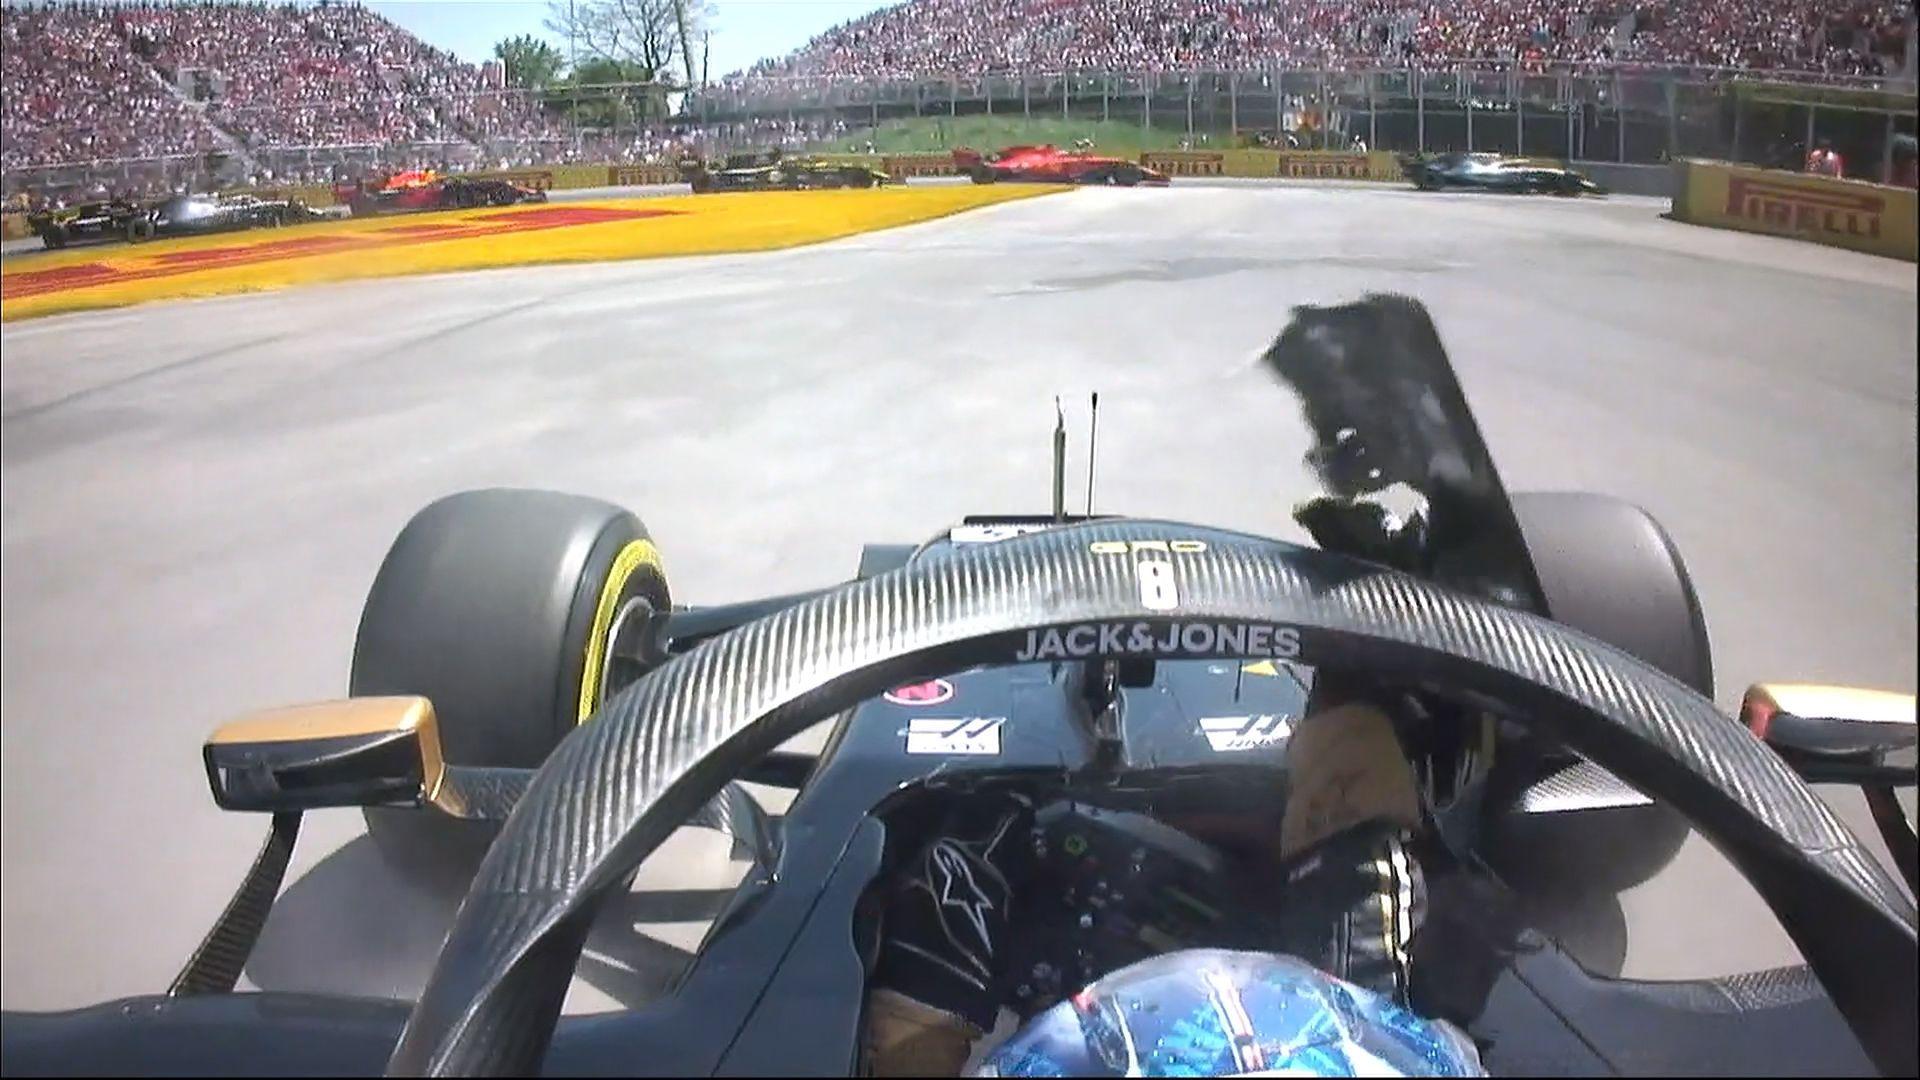 Canadian Gp Grosjean Forced To Discard Debris From Cockpit